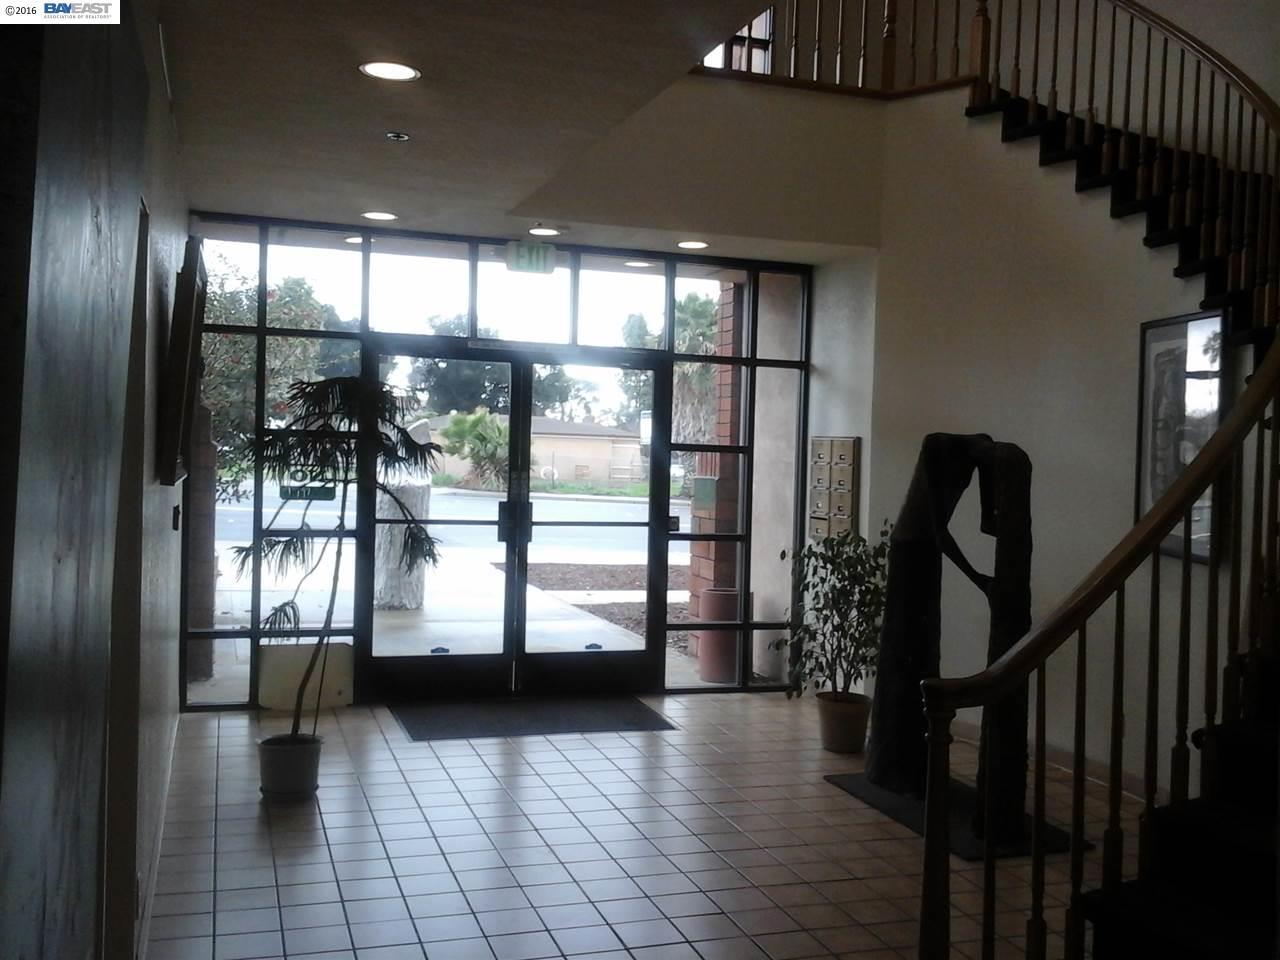 Additional photo for property listing at 3755 Washington Blvd.  FREMONT, CALIFORNIA 94538